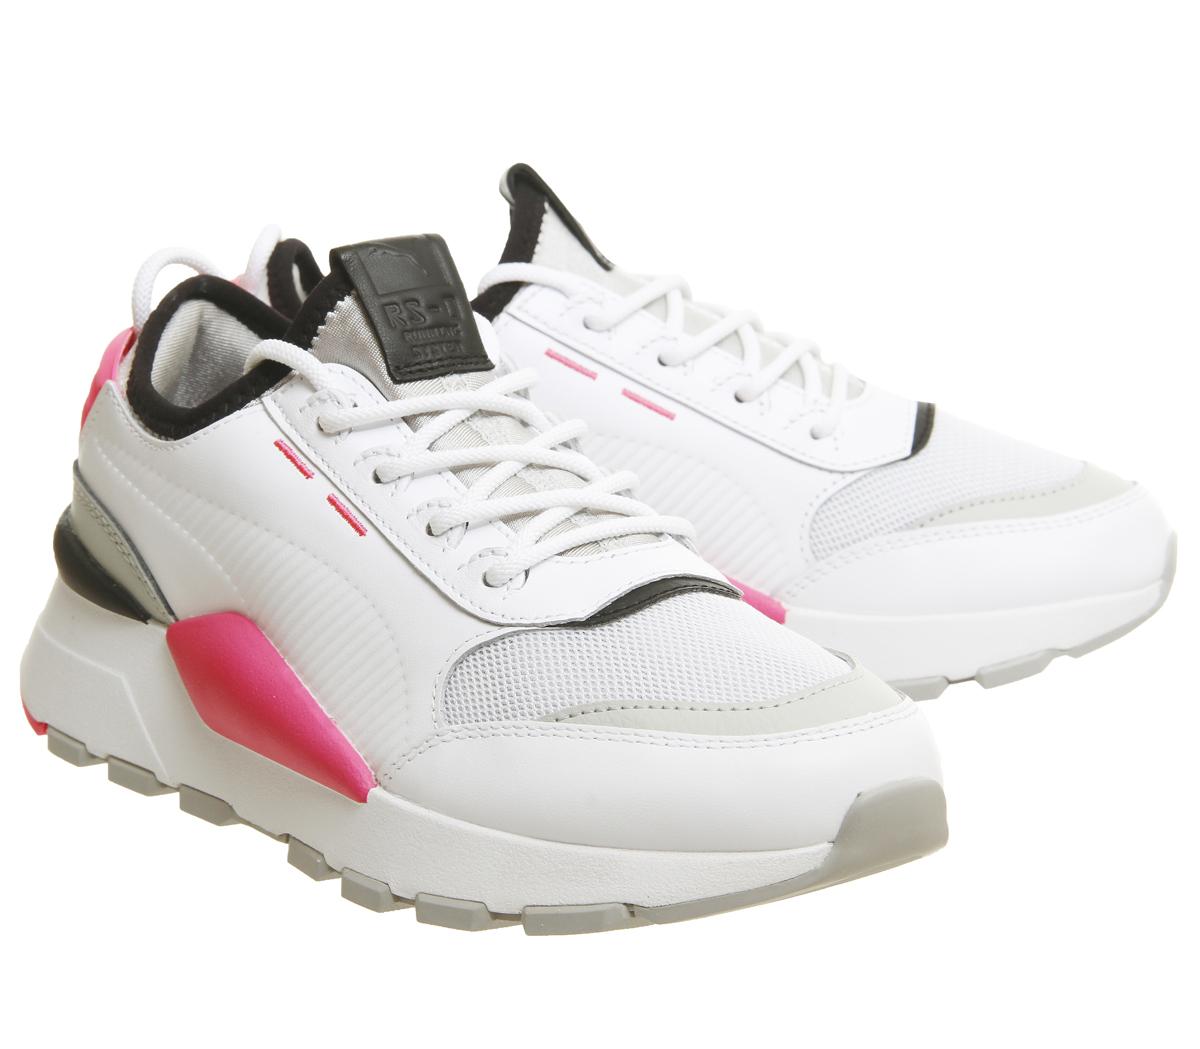 763b4886a6 SENTINEL Womens Puma Rs-0 suono scarpe da ginnastica PUMA grigio KNOCKOUT  rosa formatori scarpe bianco